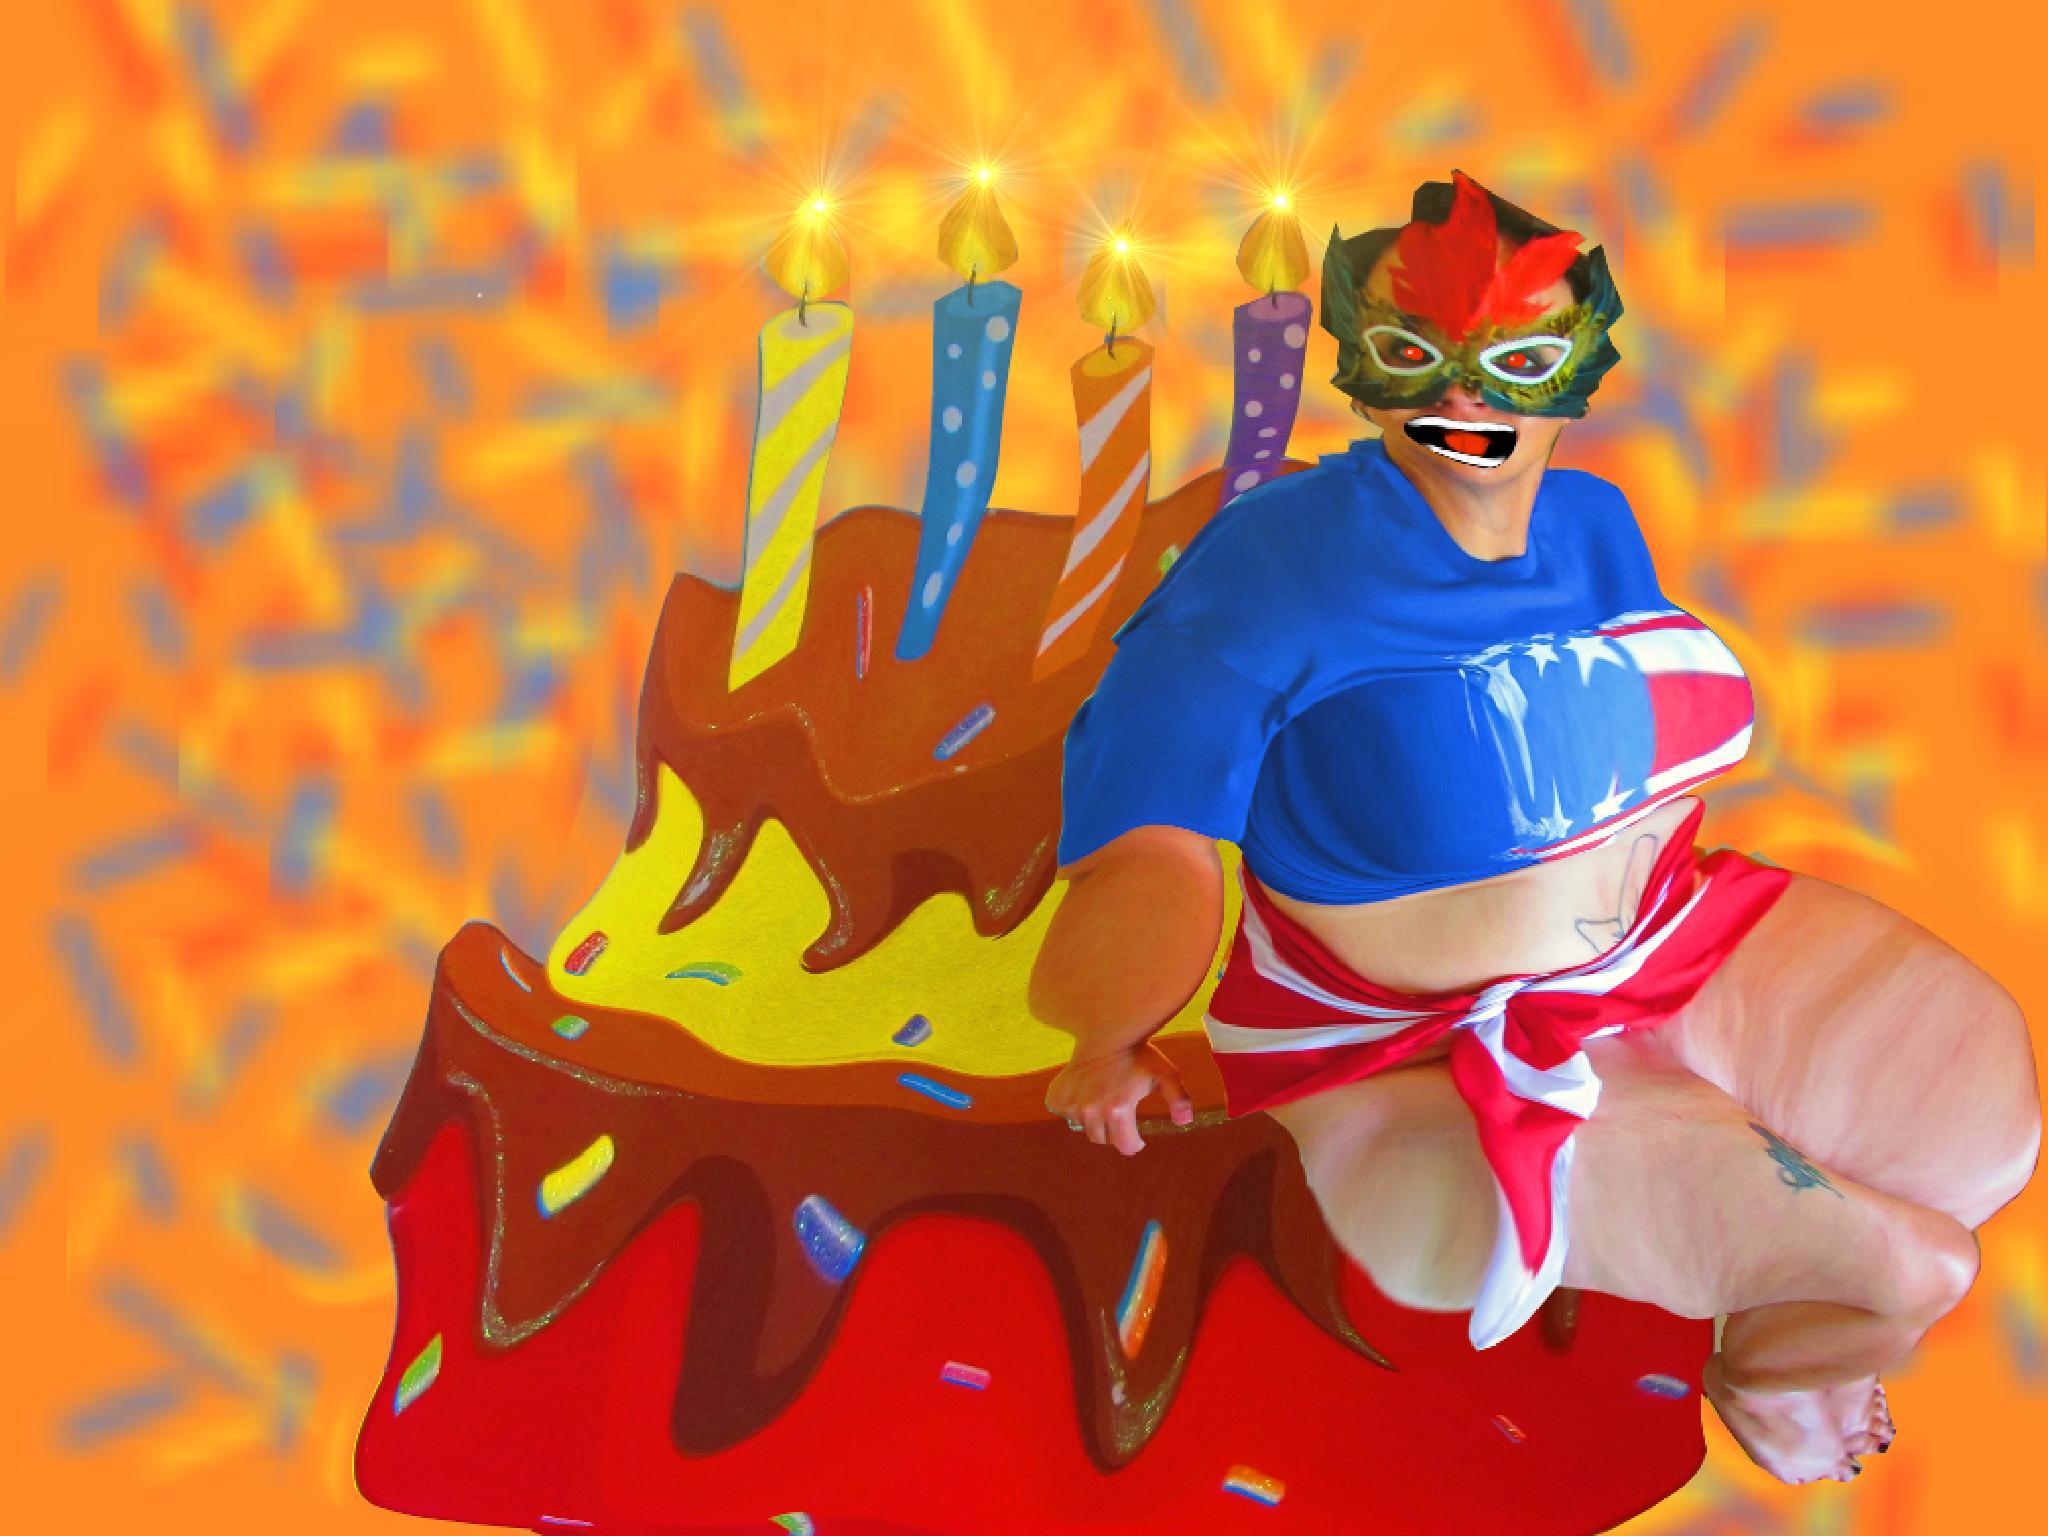 Fat as America - Fatty Cake Fatty Cake by FATasAMERICA